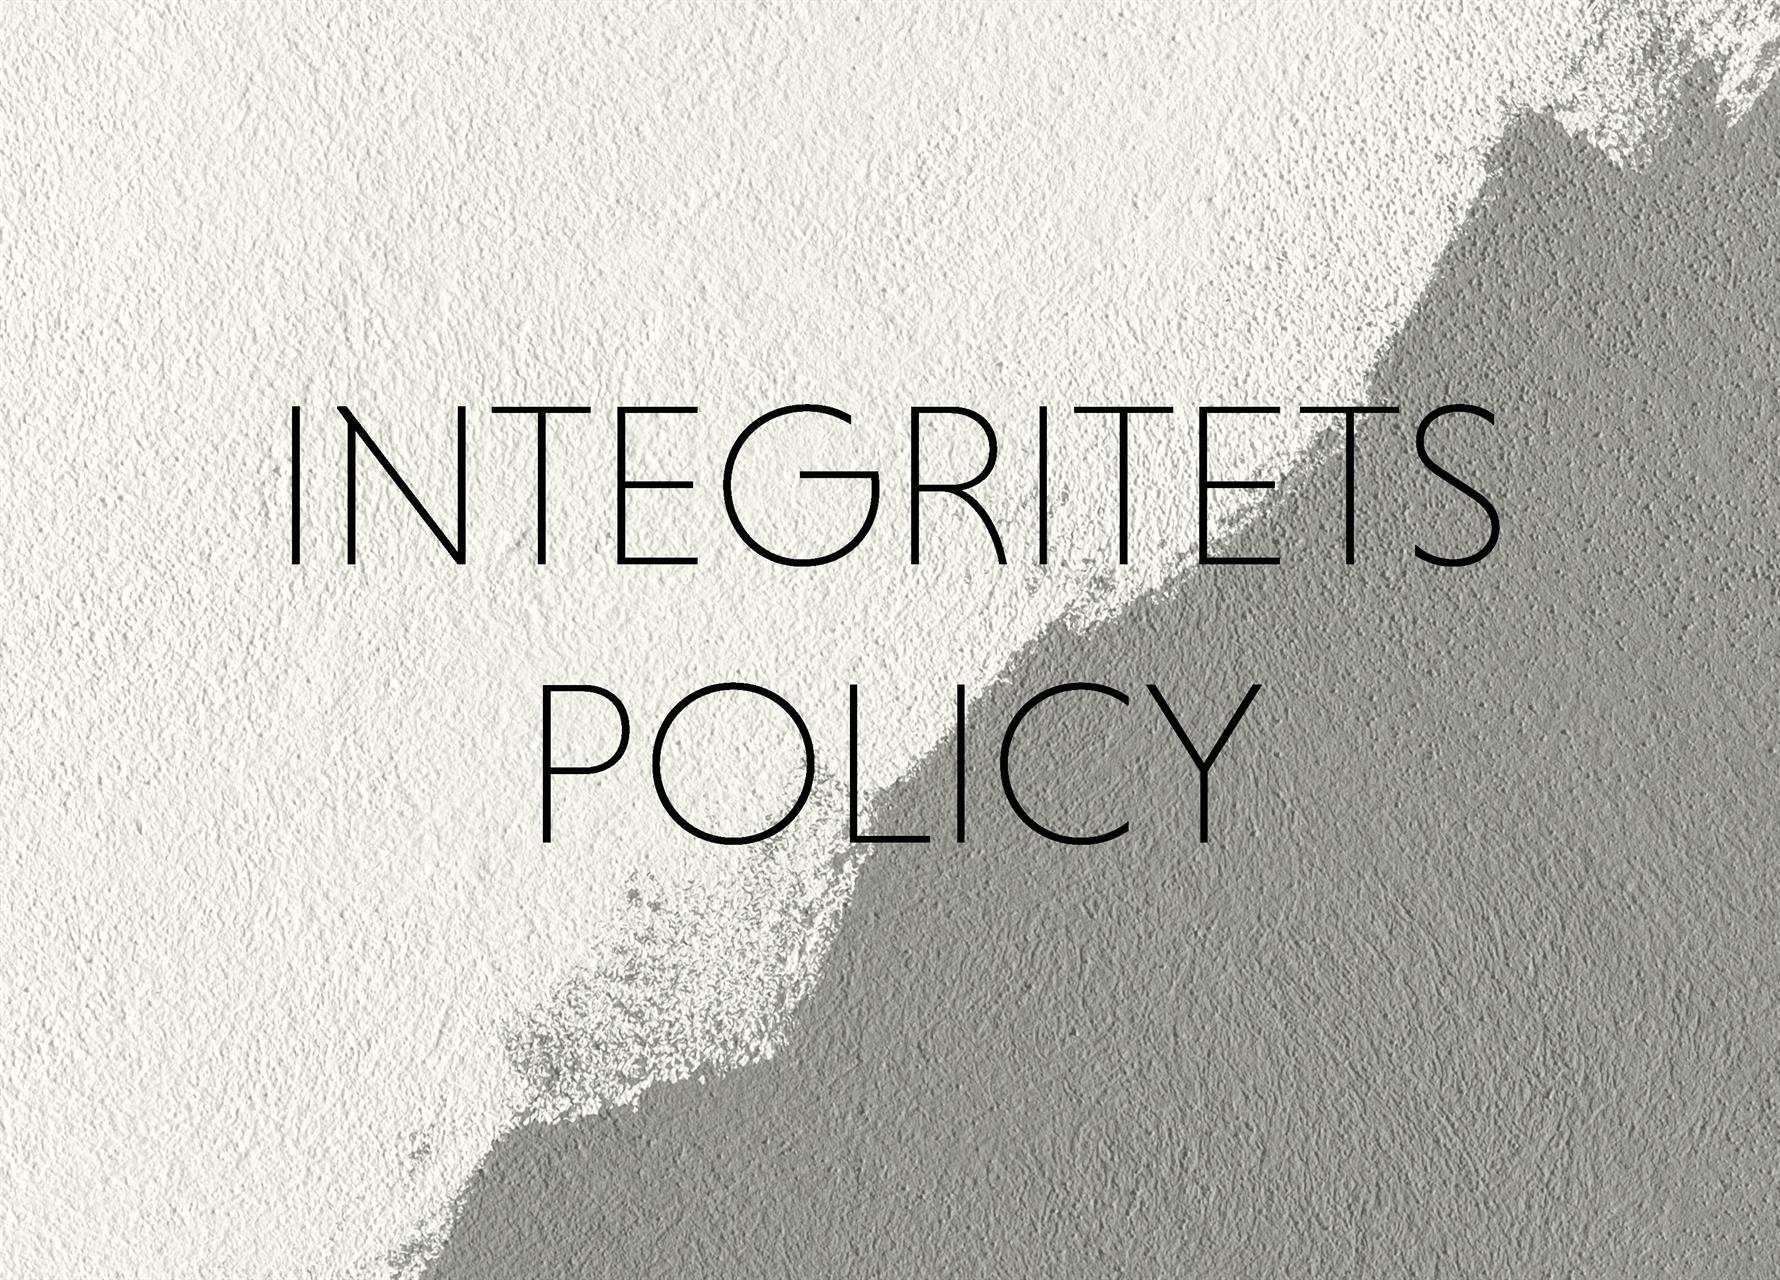 Integritetspolicy K/M